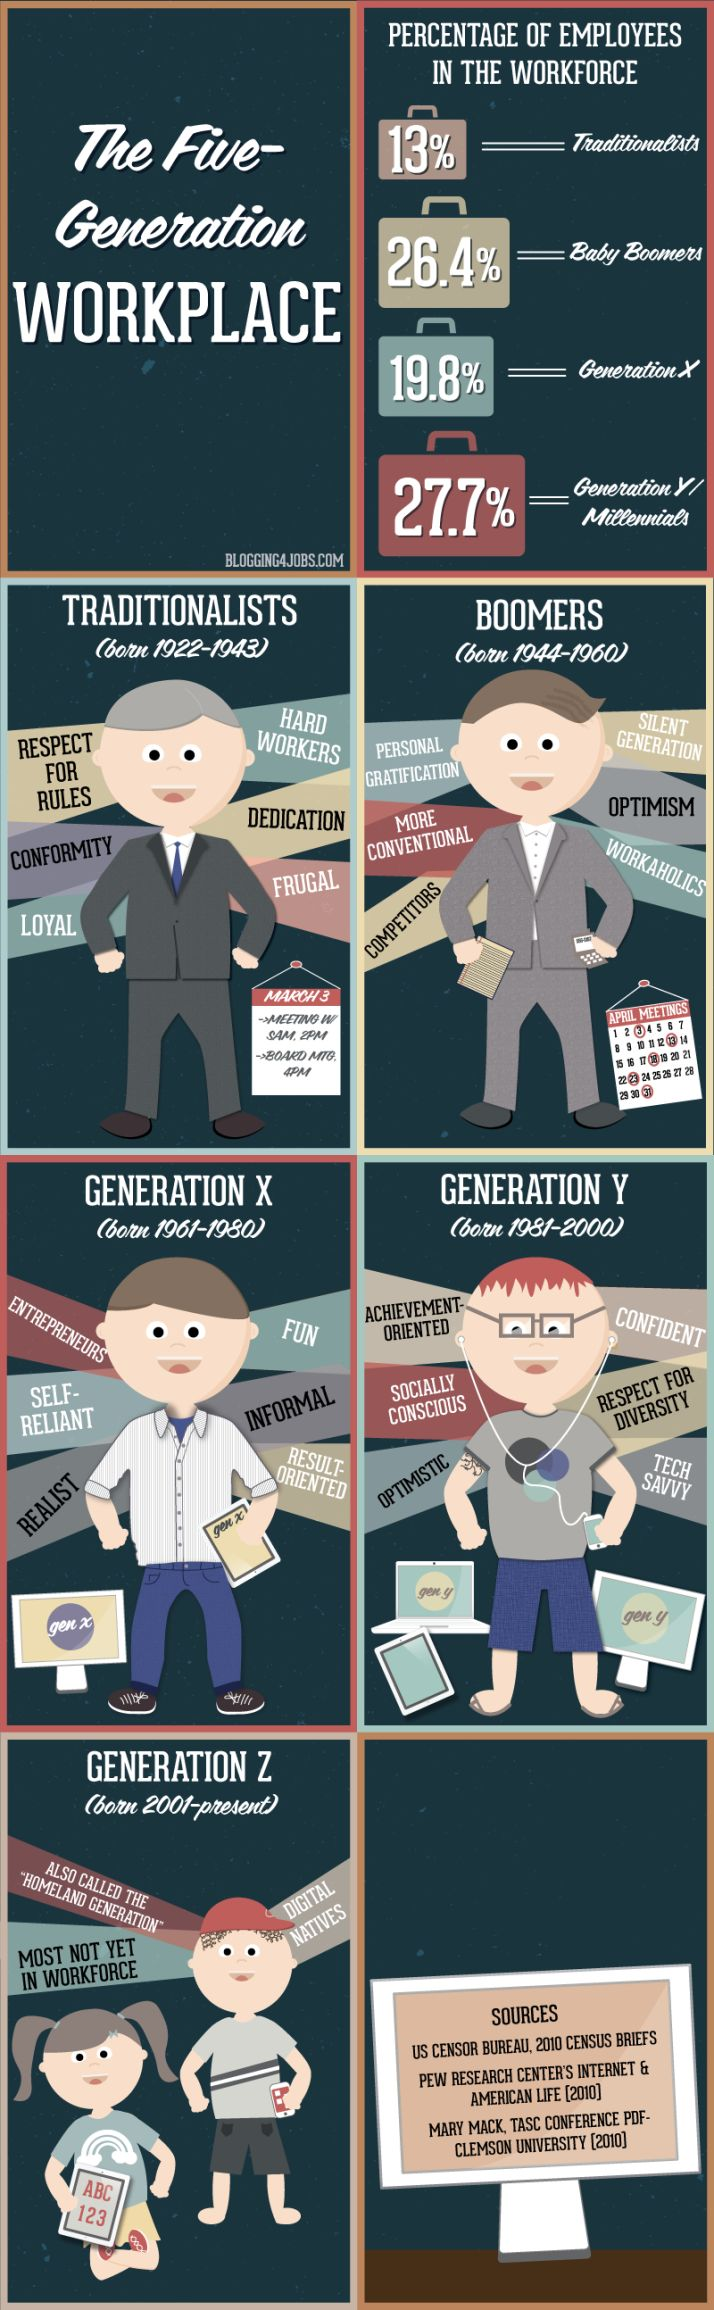 5 generaciones diferentes en el trabajo #infografia #infographic